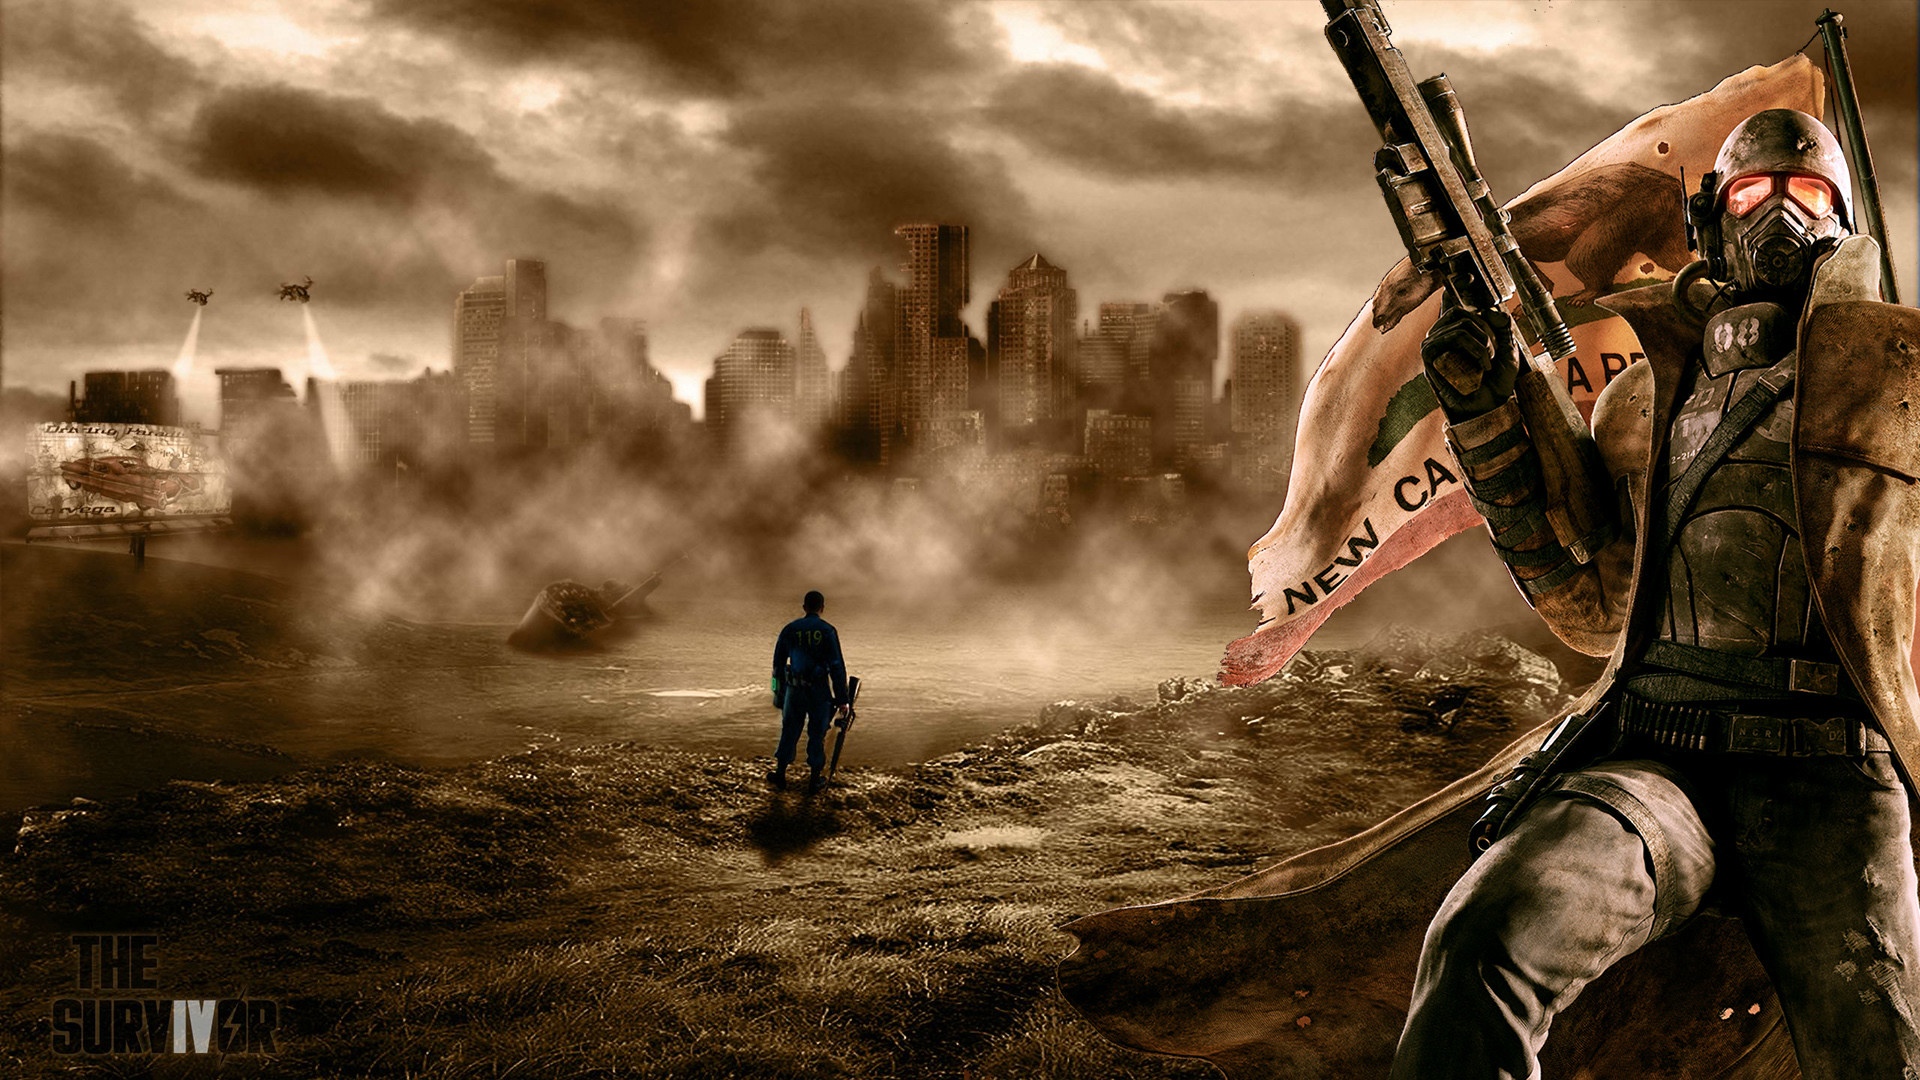 Fallout_4_Wallpaper_The_Survivor-by-bajumlufias-1